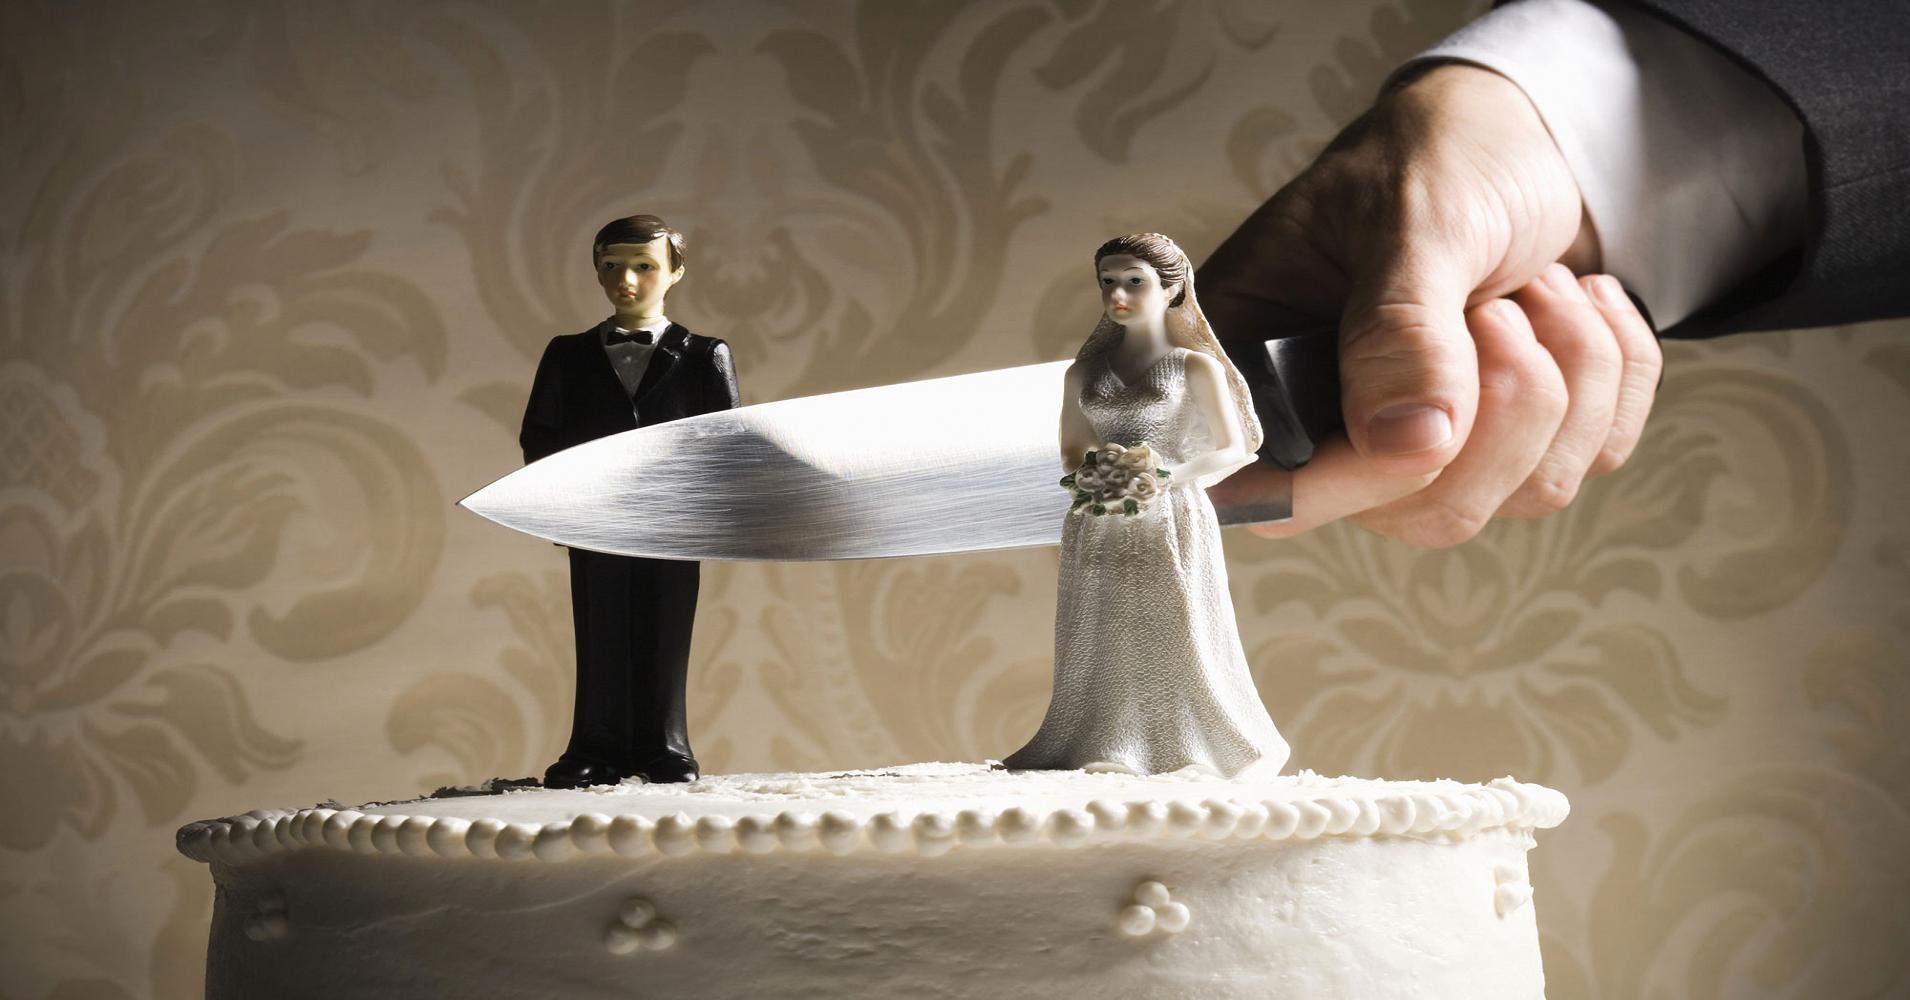 NEGOTIATING A DIVORCE SETTLEMENT